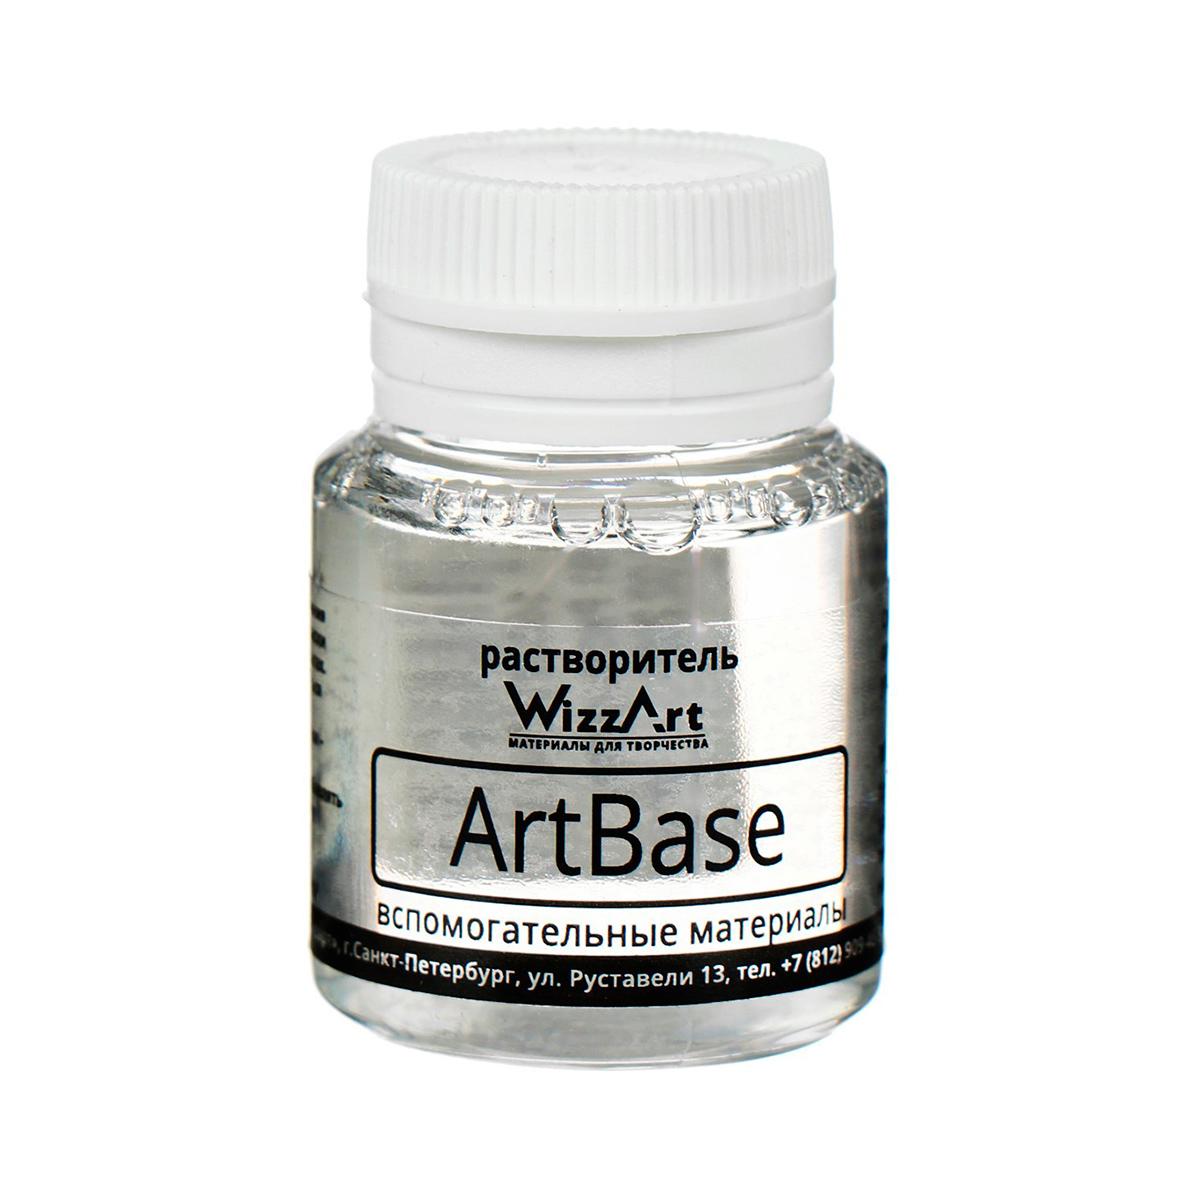 Растворитель ArtBase 80мл Wizzart